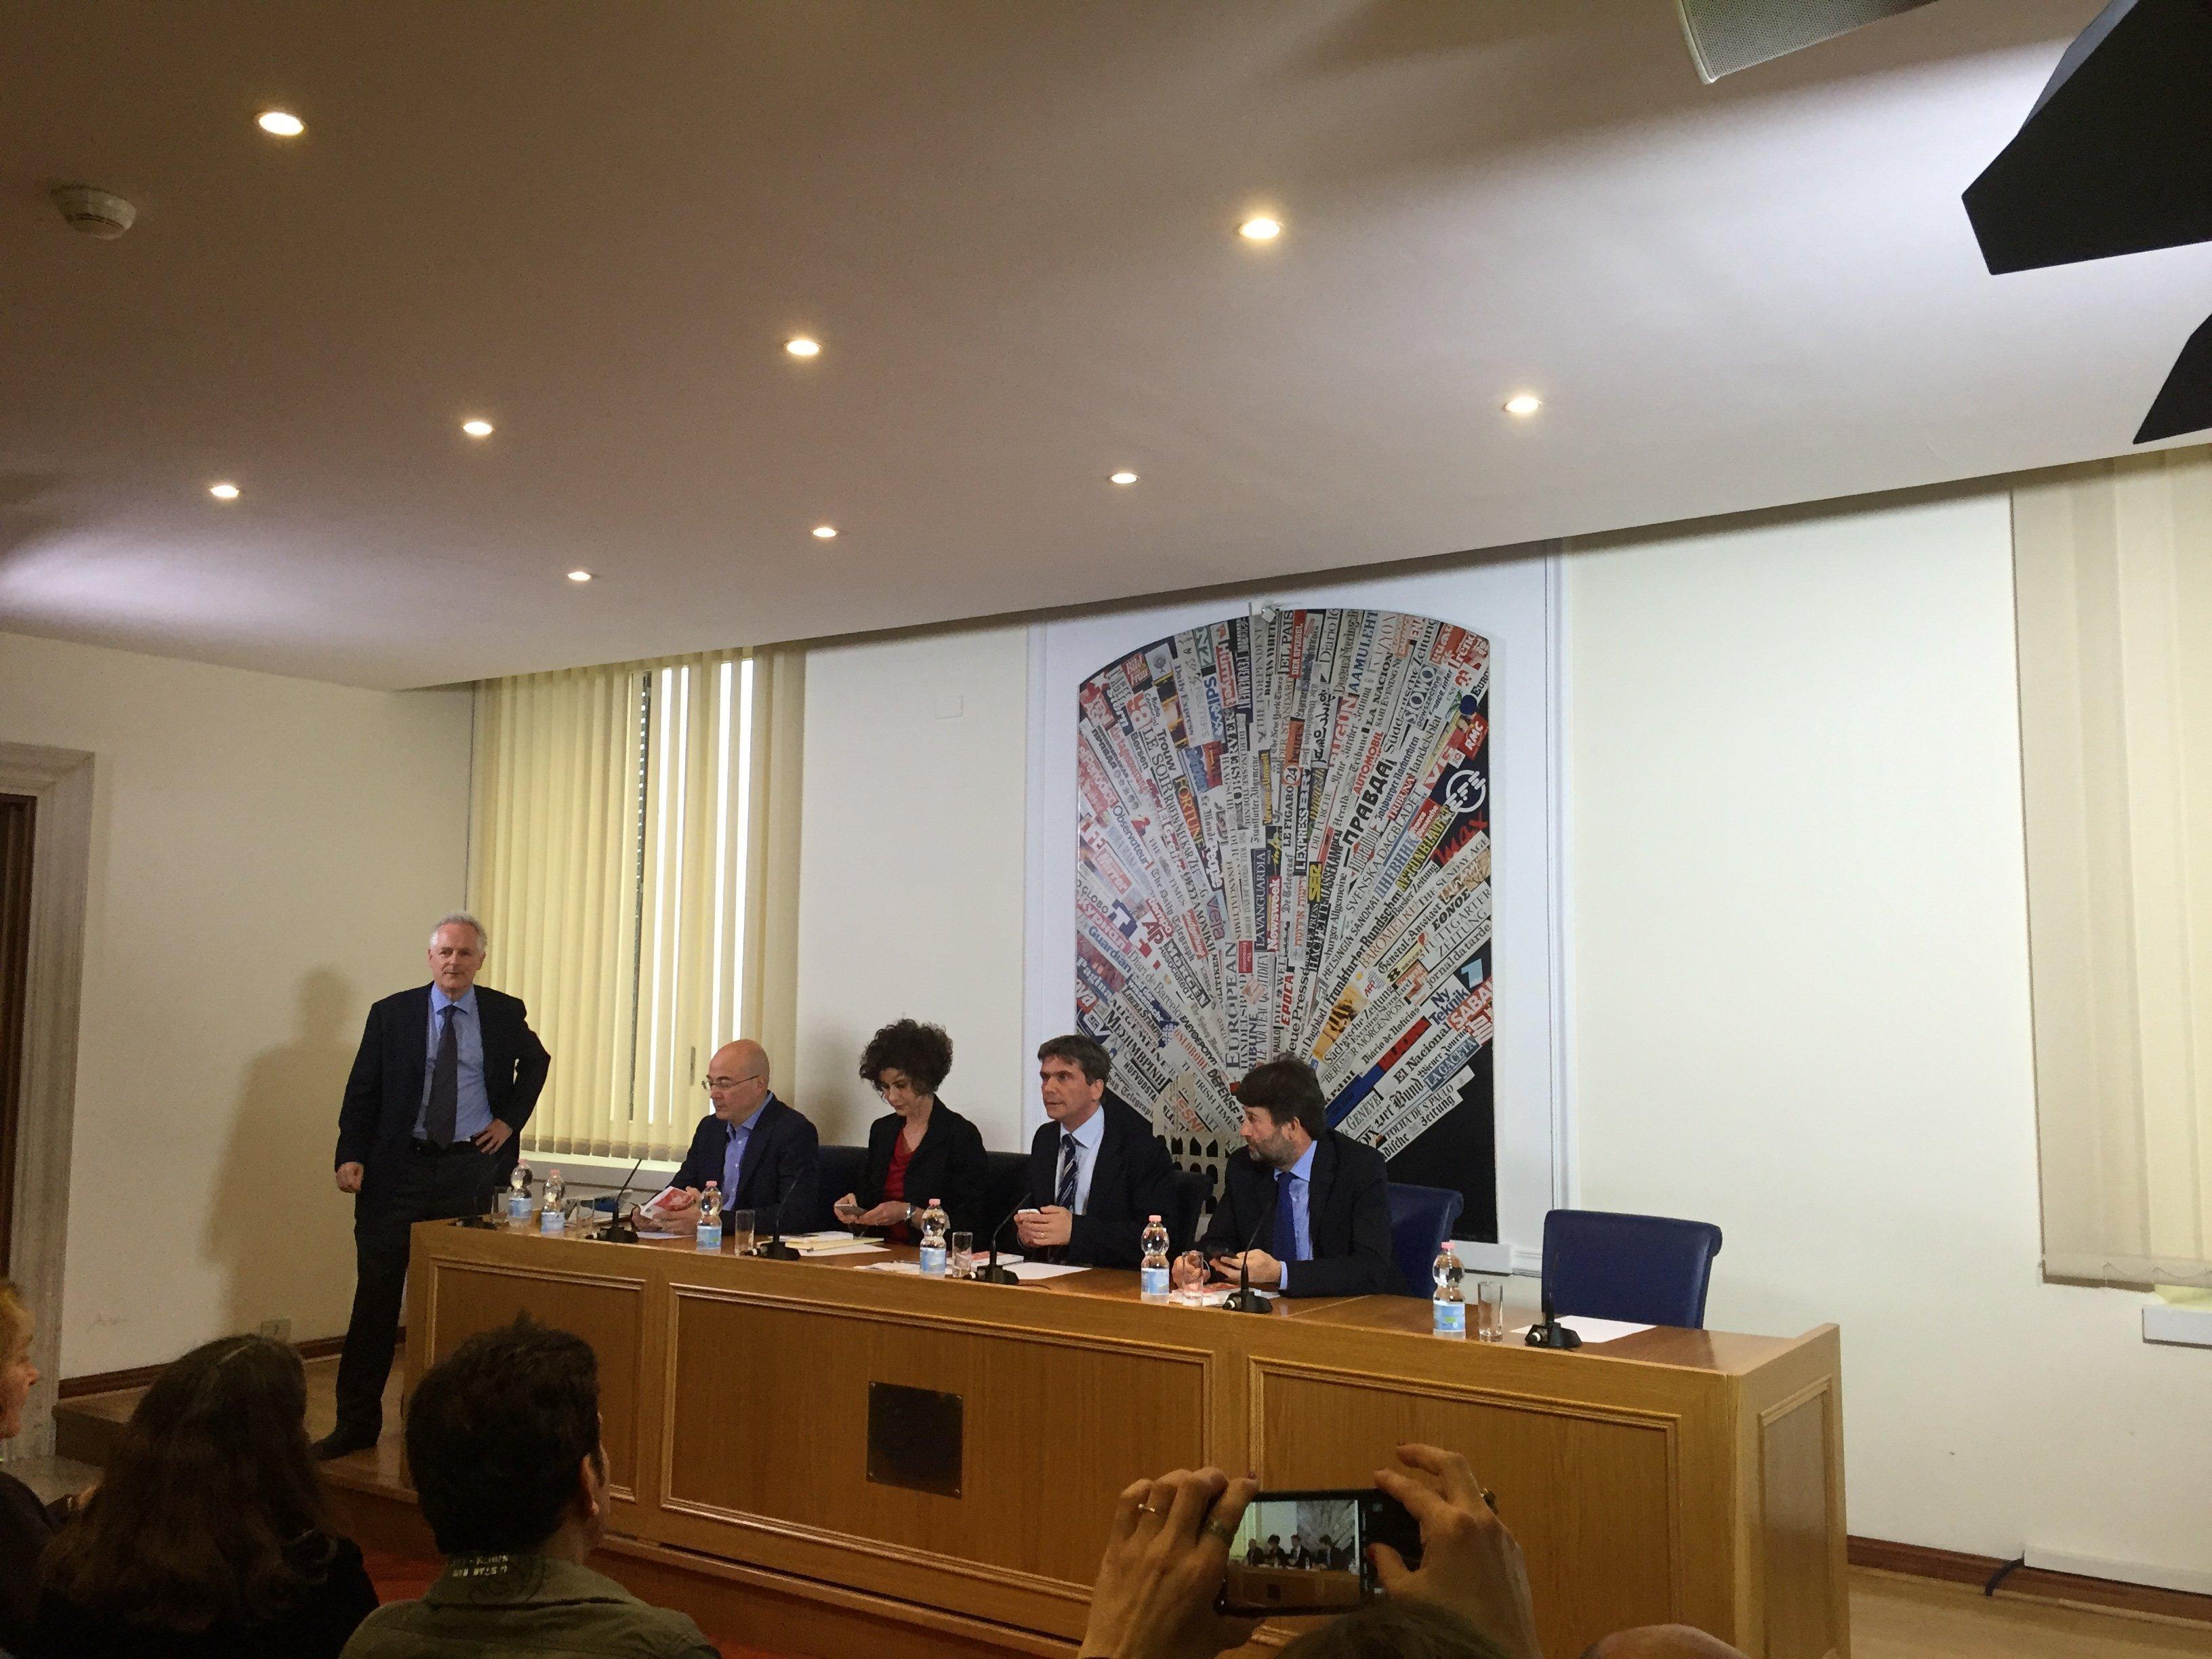 Alla presentazione del libro Talenti d'Italia da Maarten van Aalderen